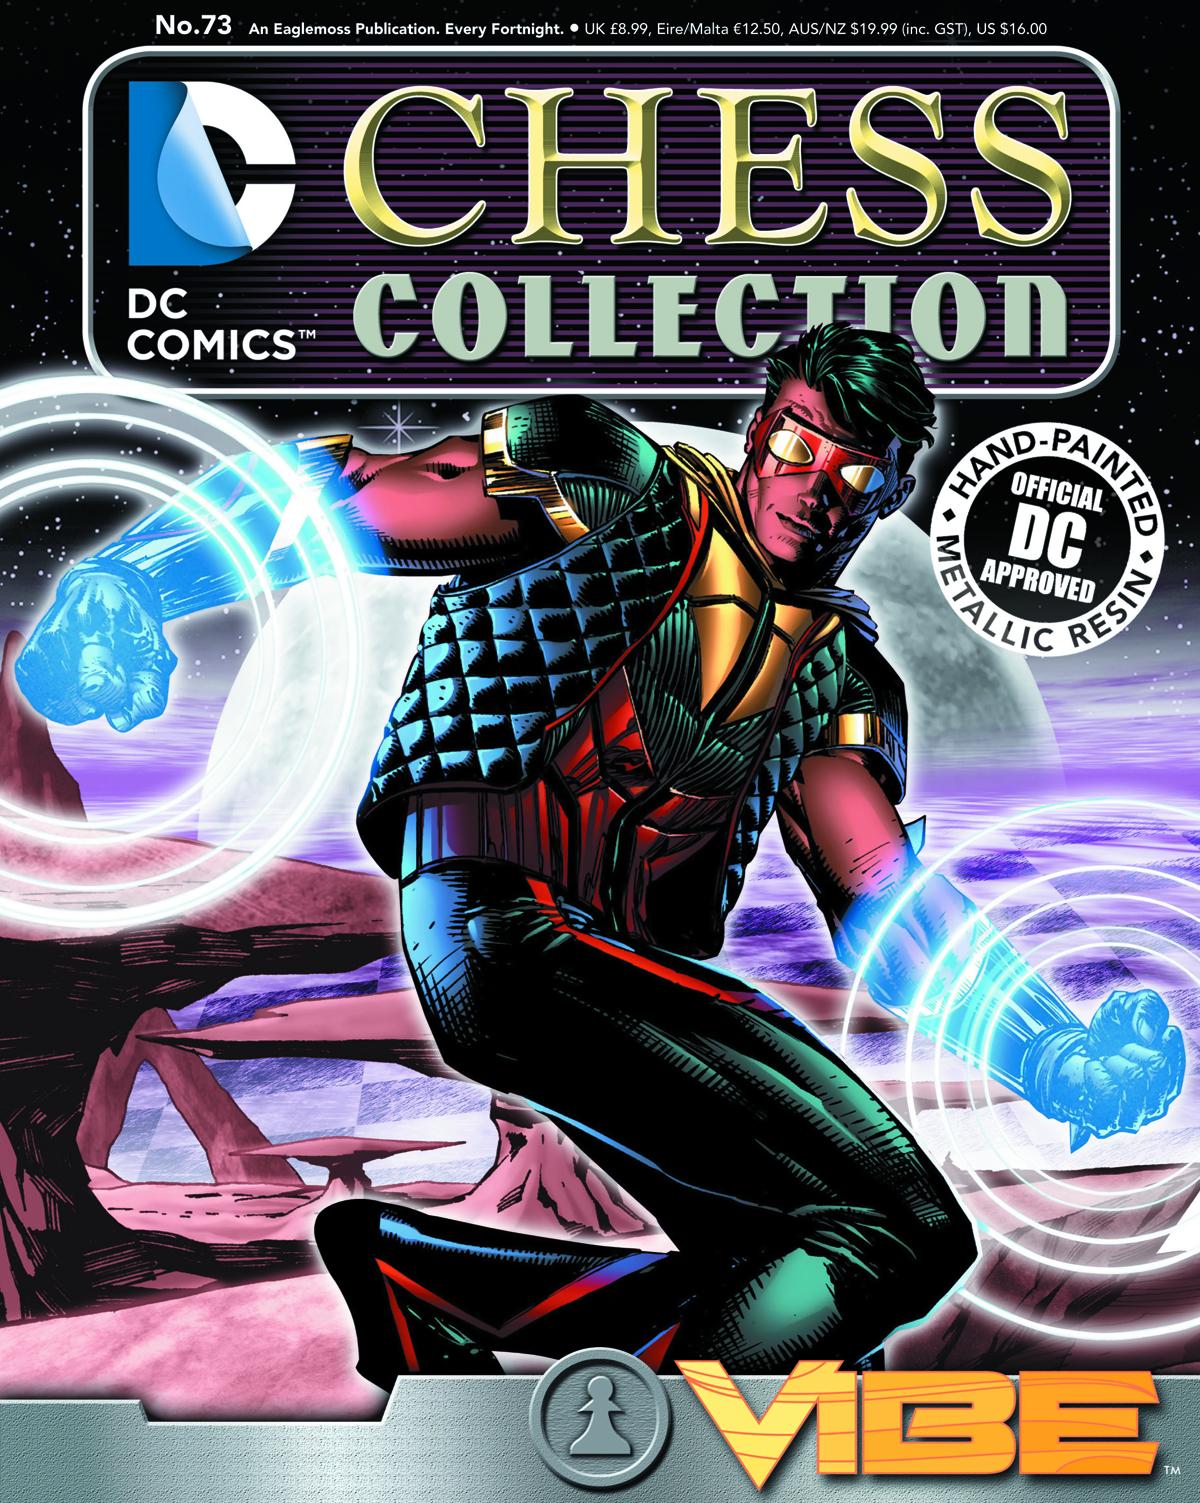 DC SUPERHERO CHESS FIG COLL MAG #73 VIBE WHITE PAWN